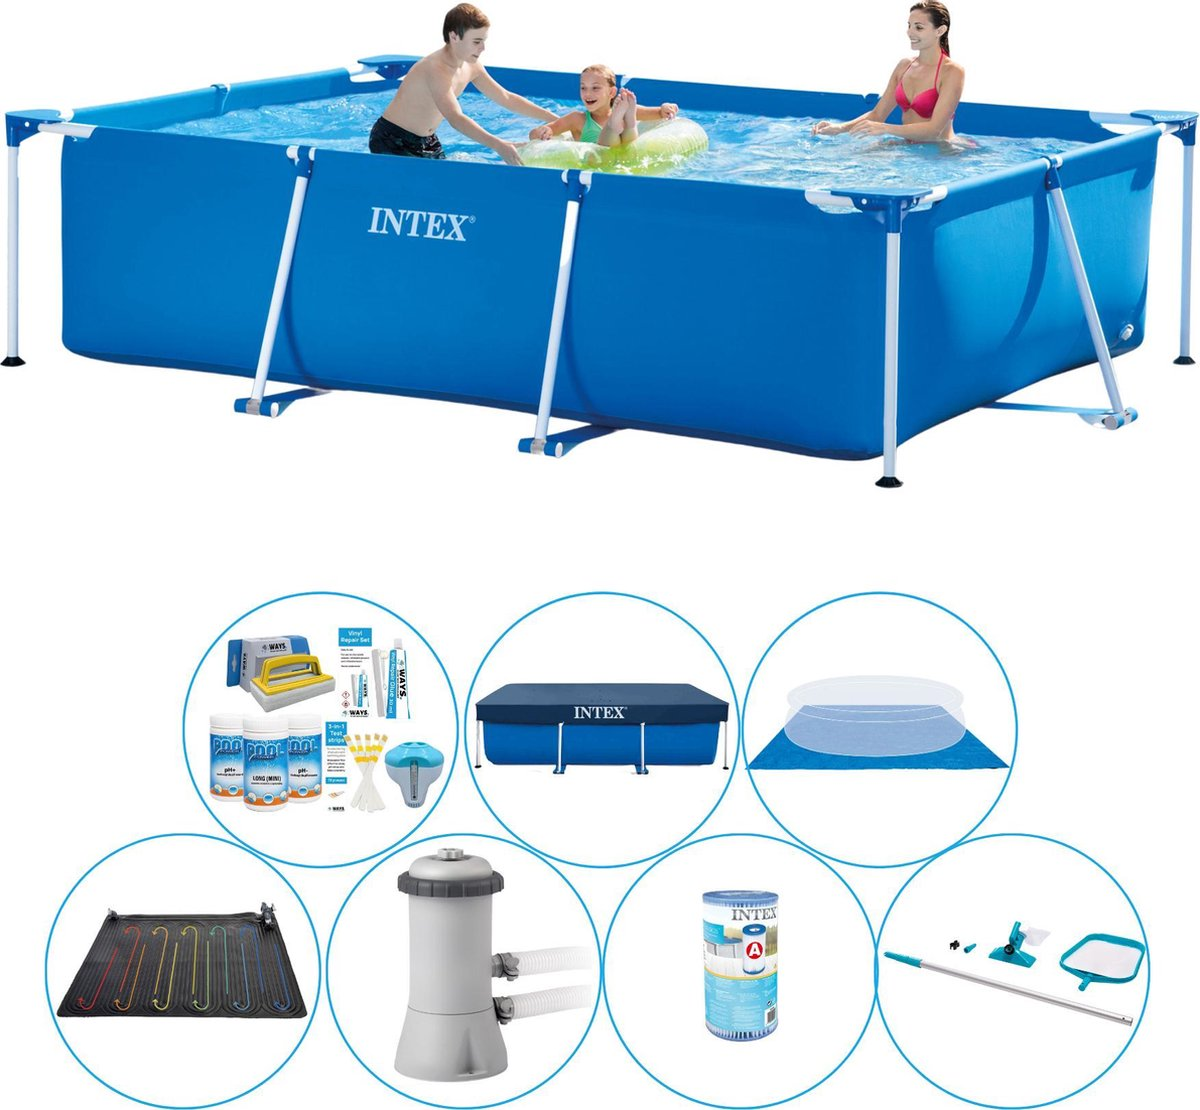 Intex Frame Pool Rechthoekig 300x200x75 cm - Zwembad Pakket